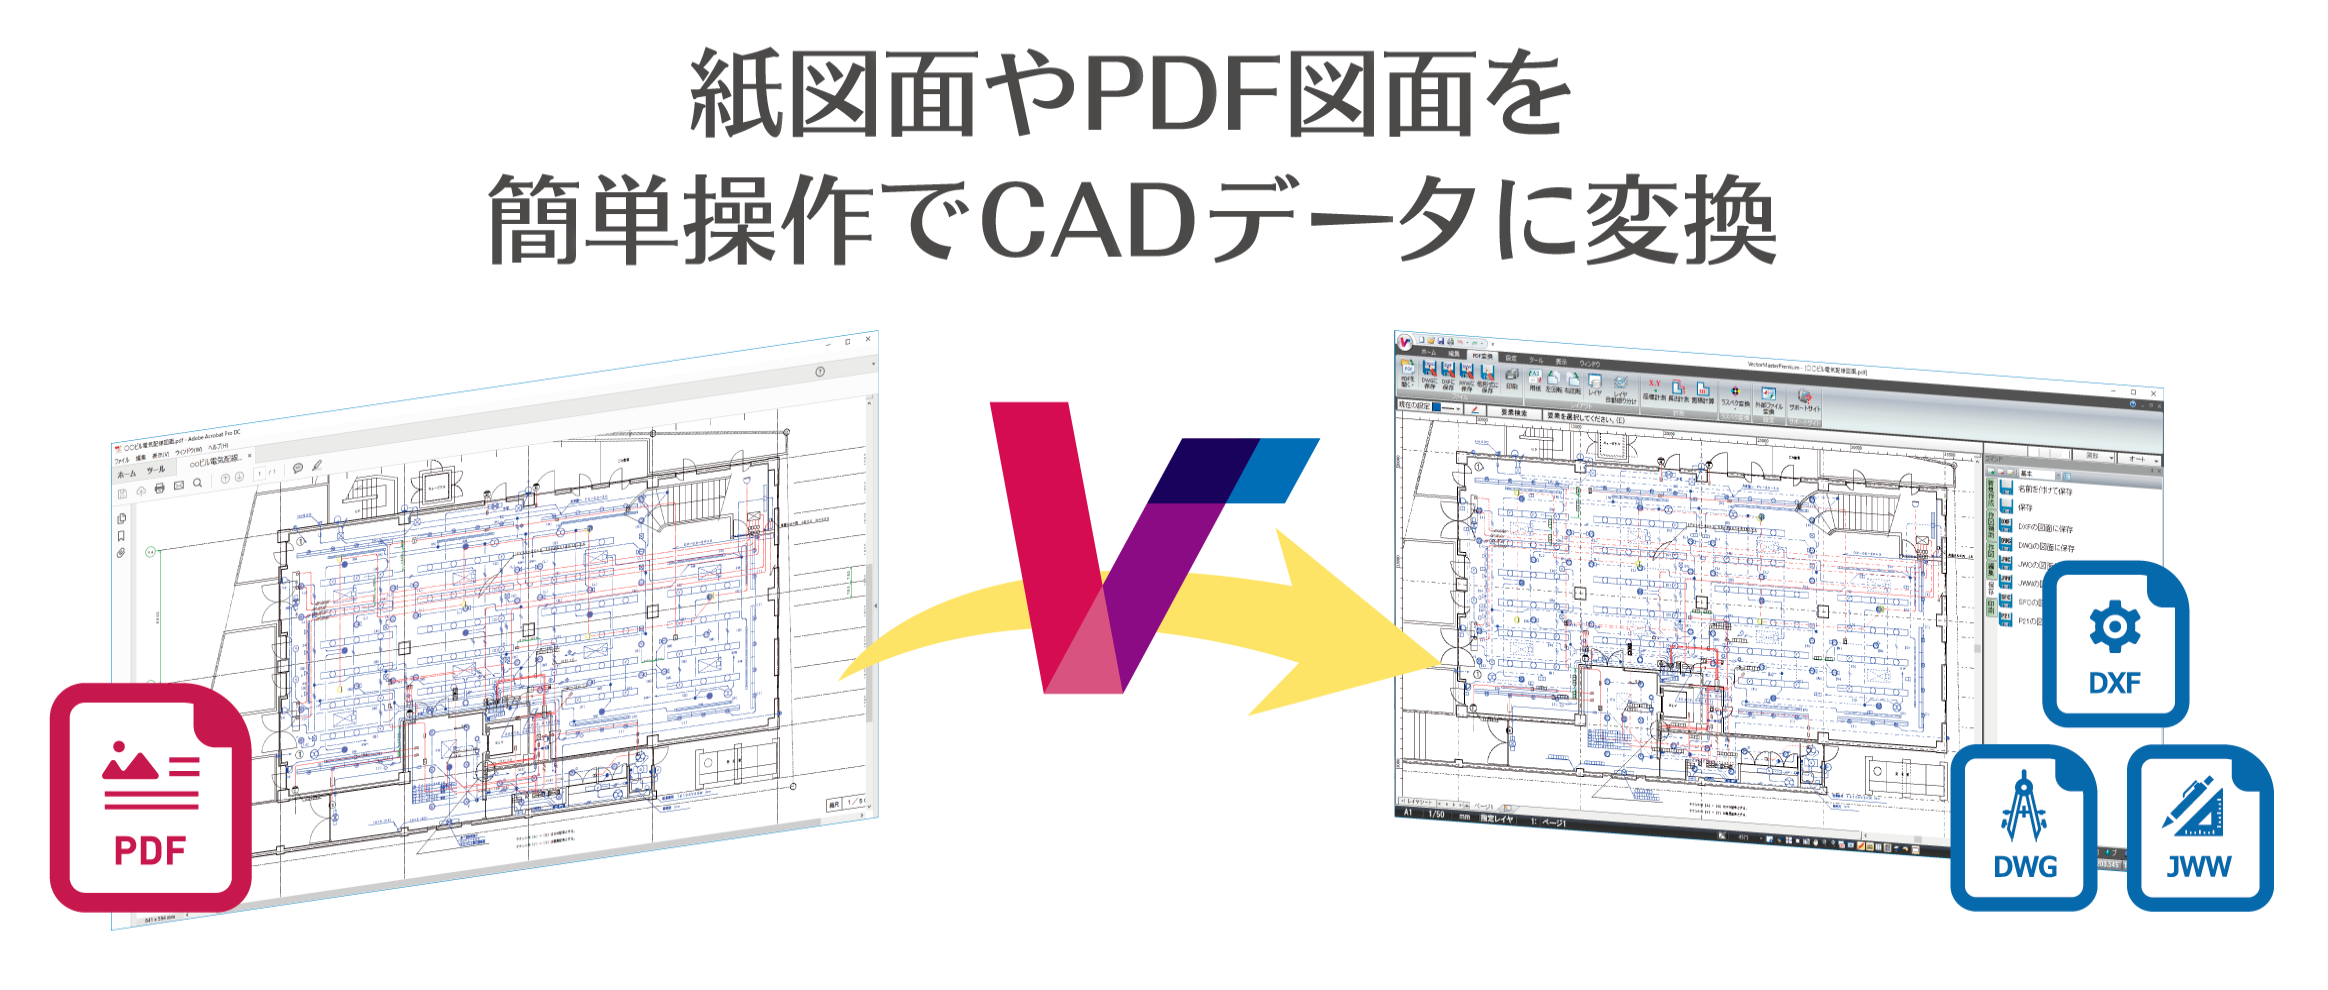 Ç´™å›³é¢ Pdf図面cad変換システム Vectormasterpremium